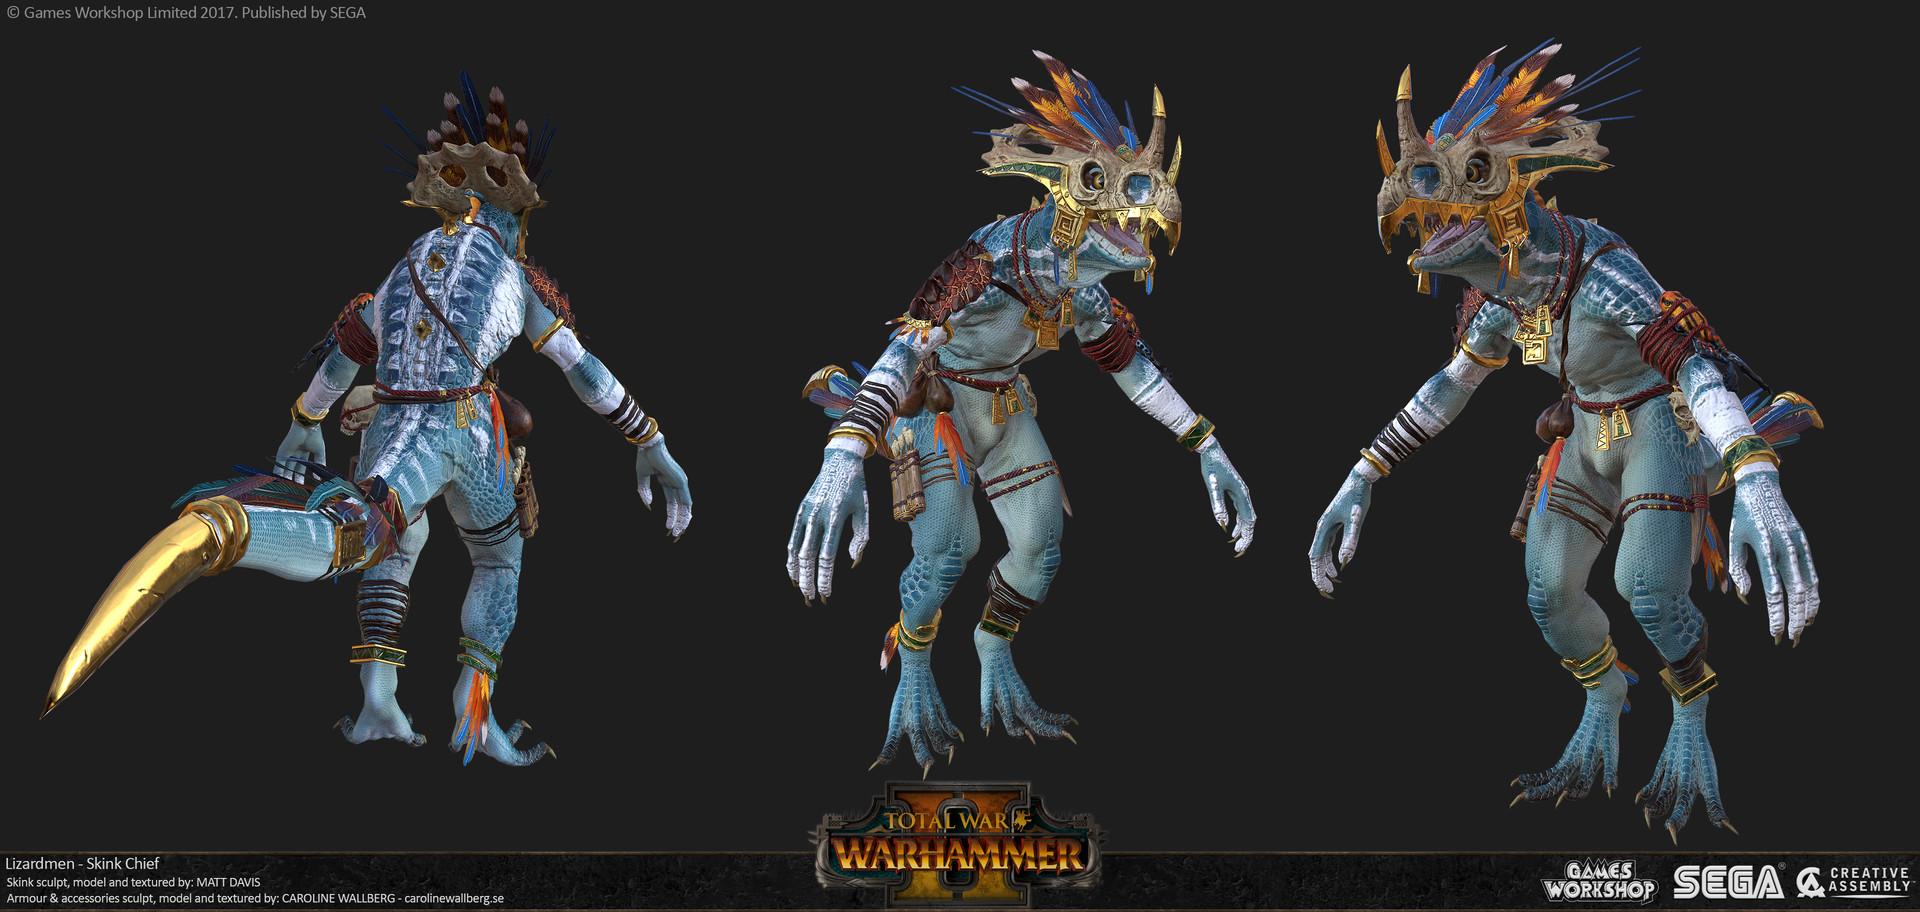 ArtStation - Total War: Warhammer - Skink Chief, C Wallberg